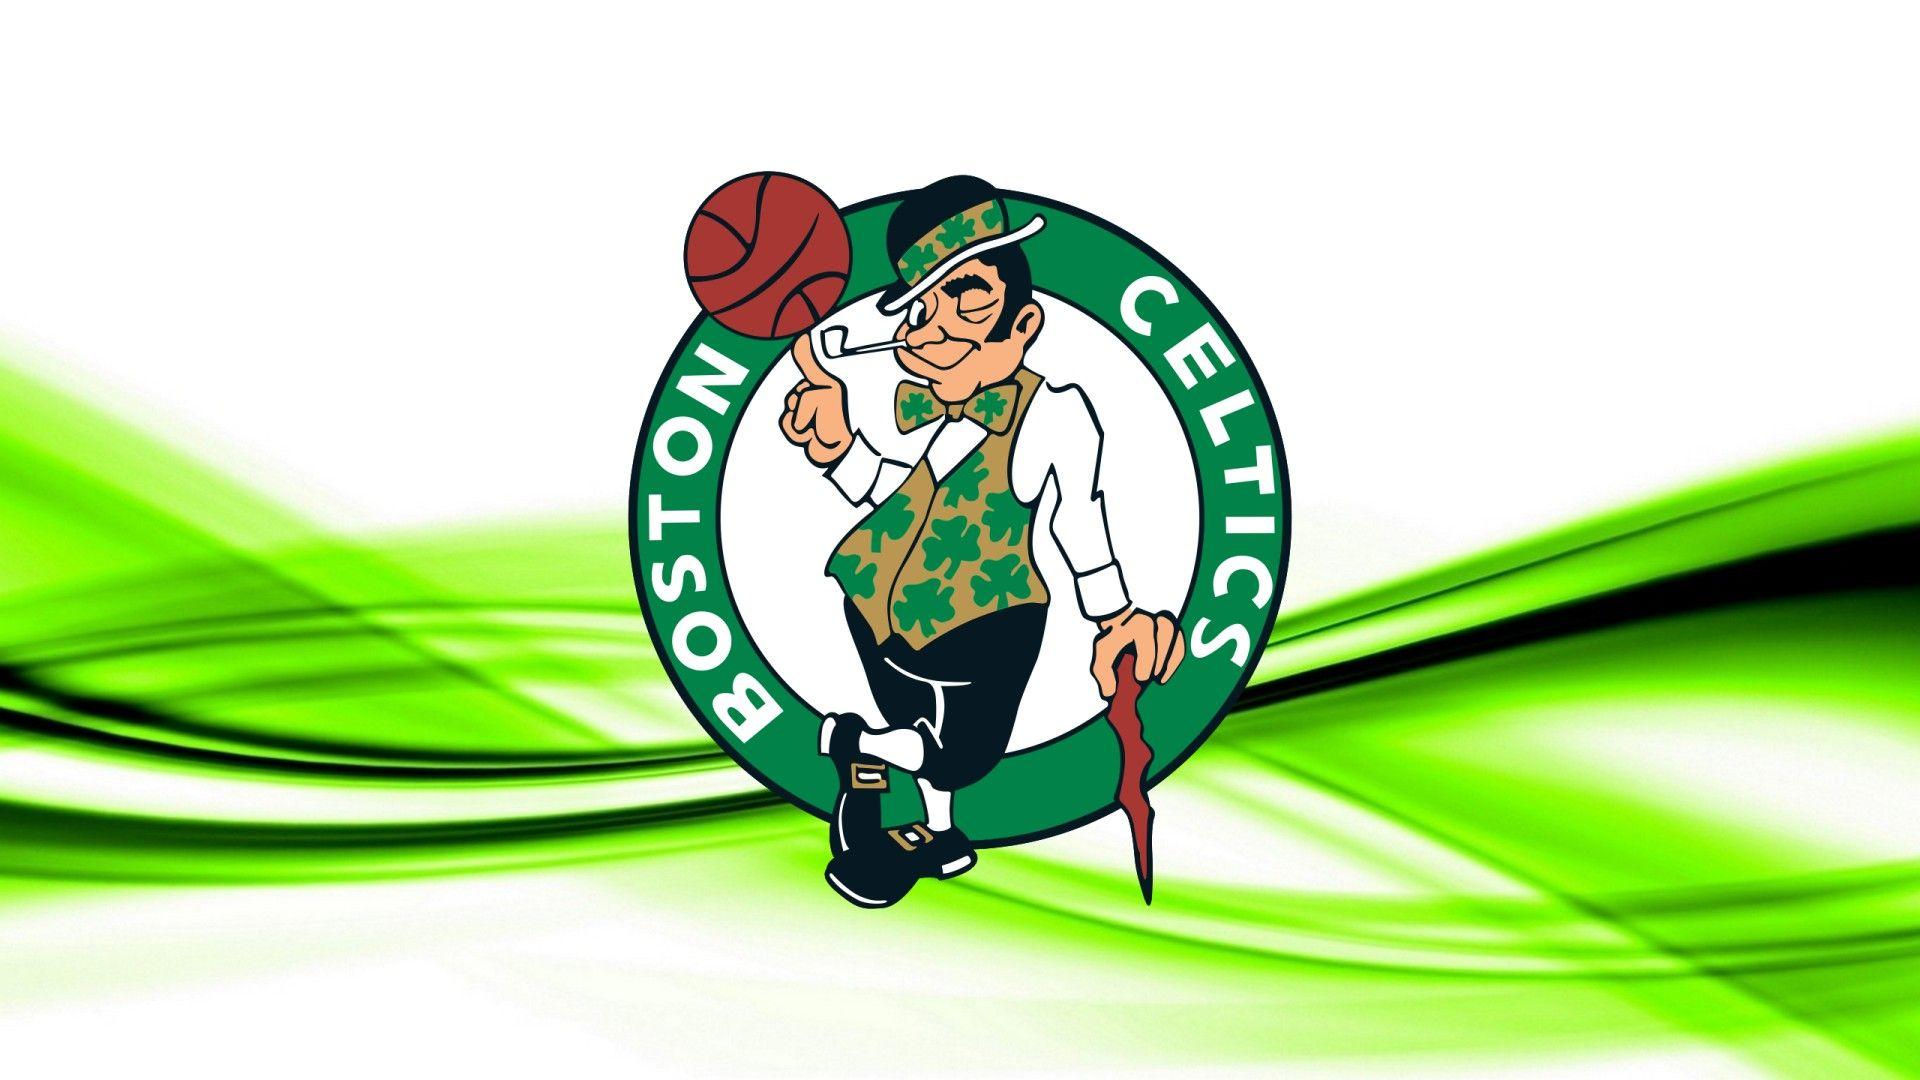 Boston Celtics Logo Mac Backgrounds Boston celtics logo